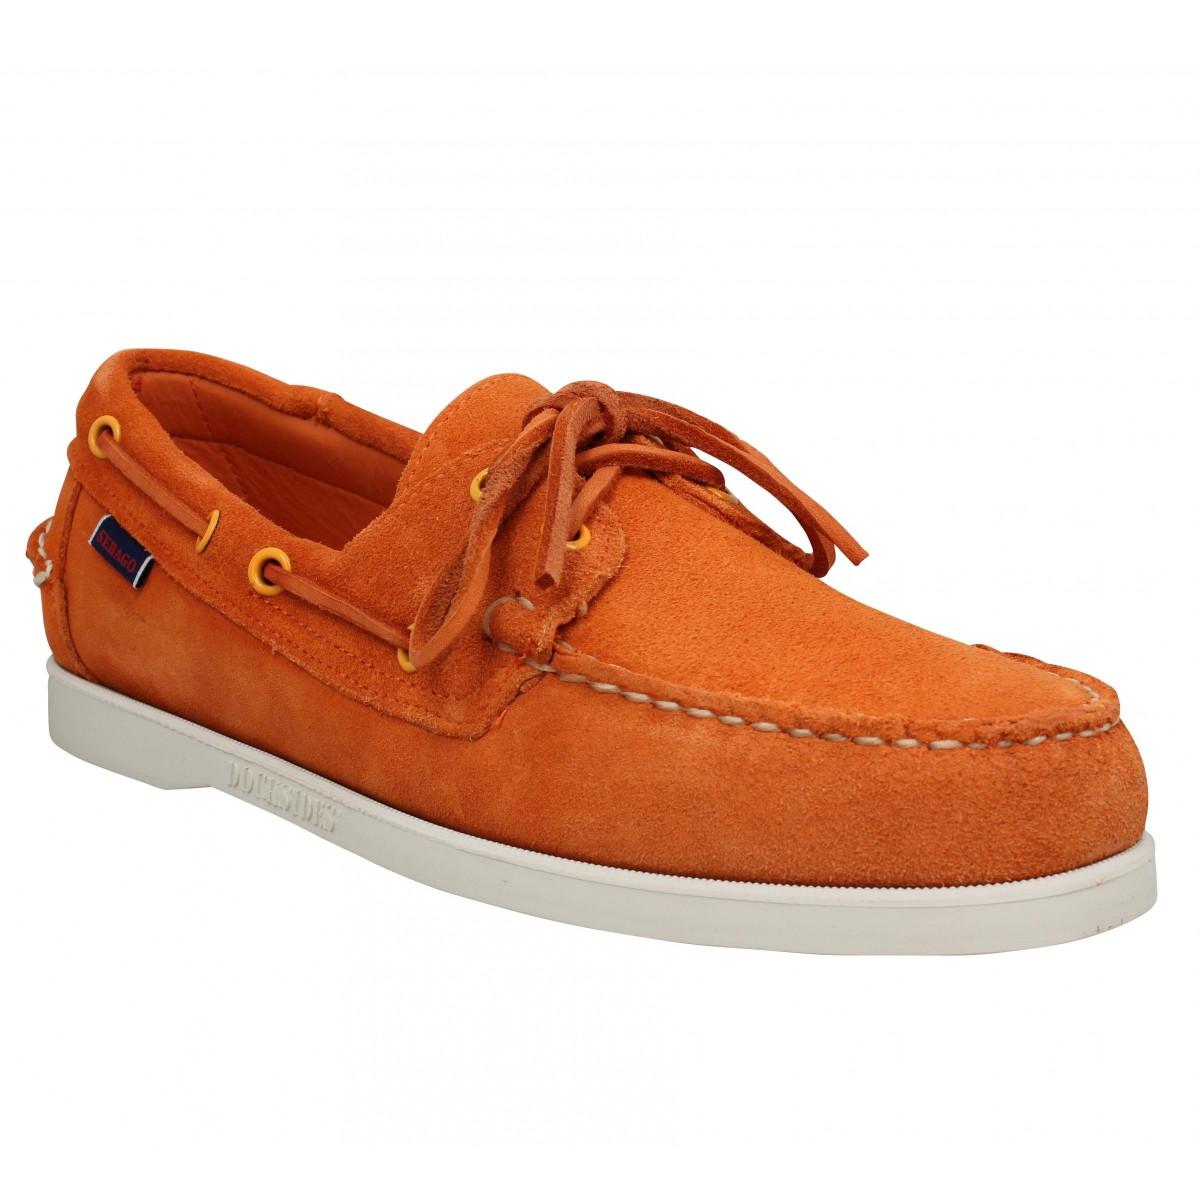 Chaussures bateaux SEBAGO Docksides Portland suede Homme Orange